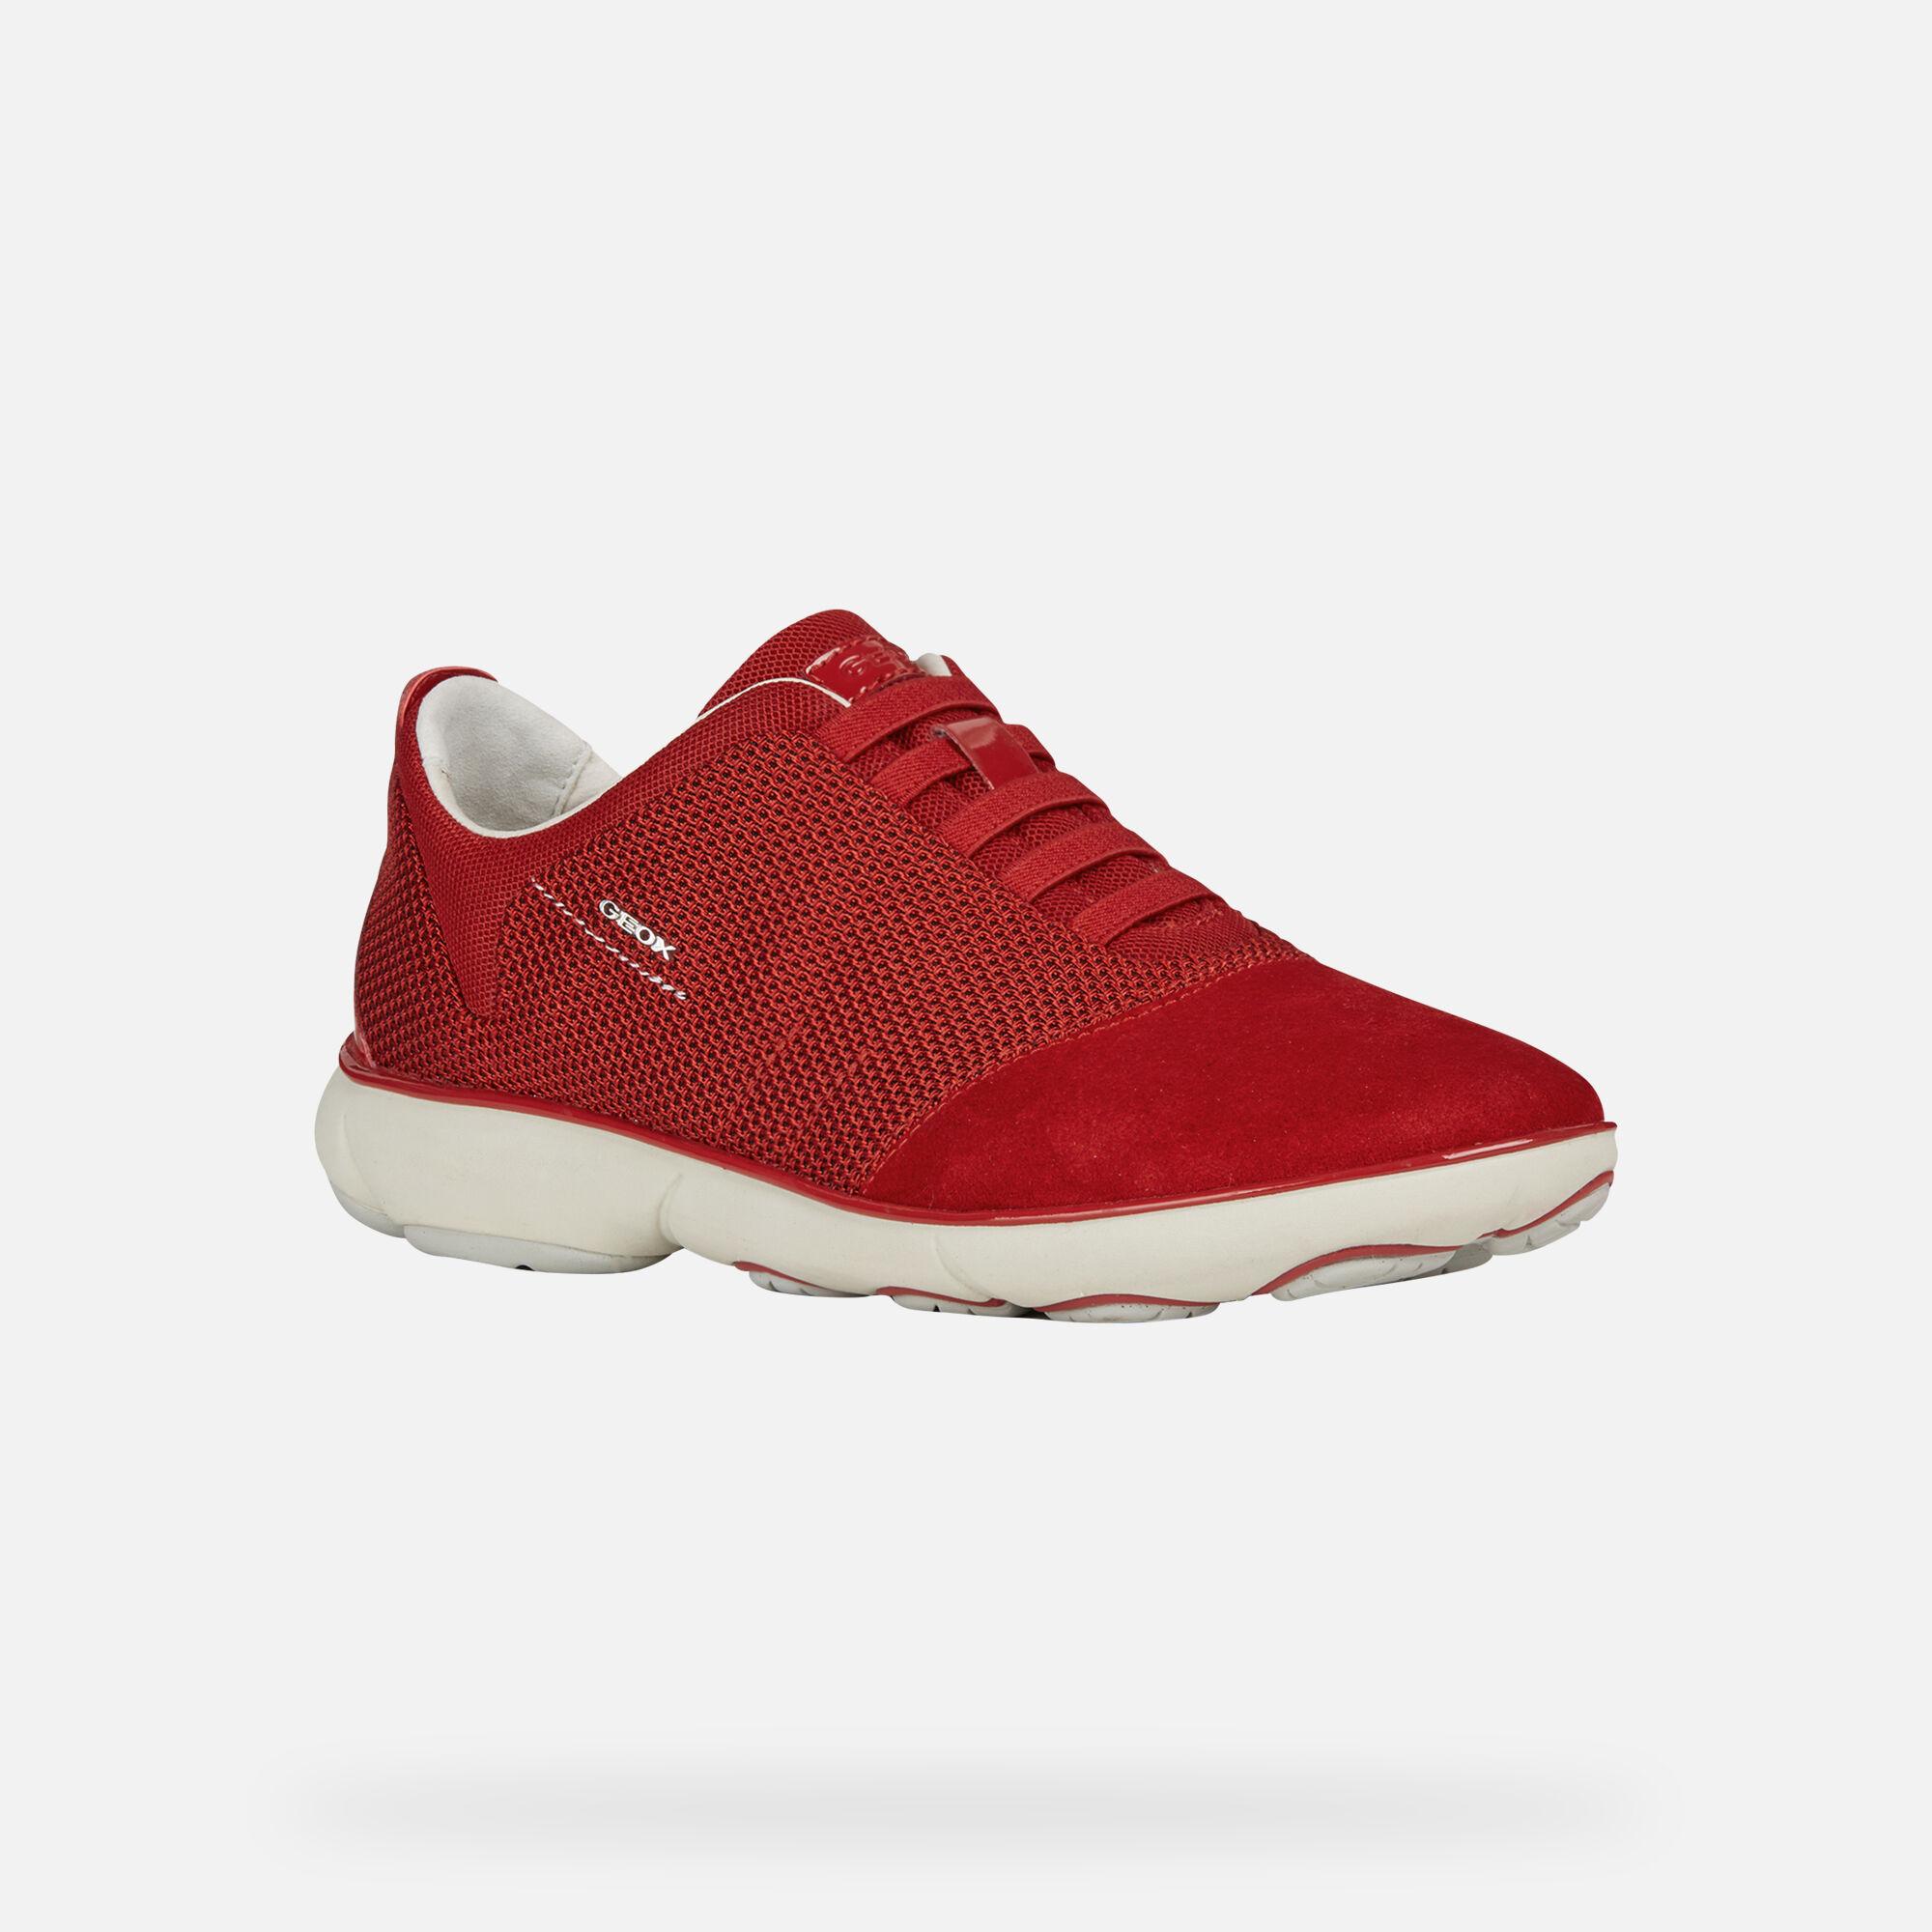 Geox NEBULA Woman: Red Sneakers   Geox